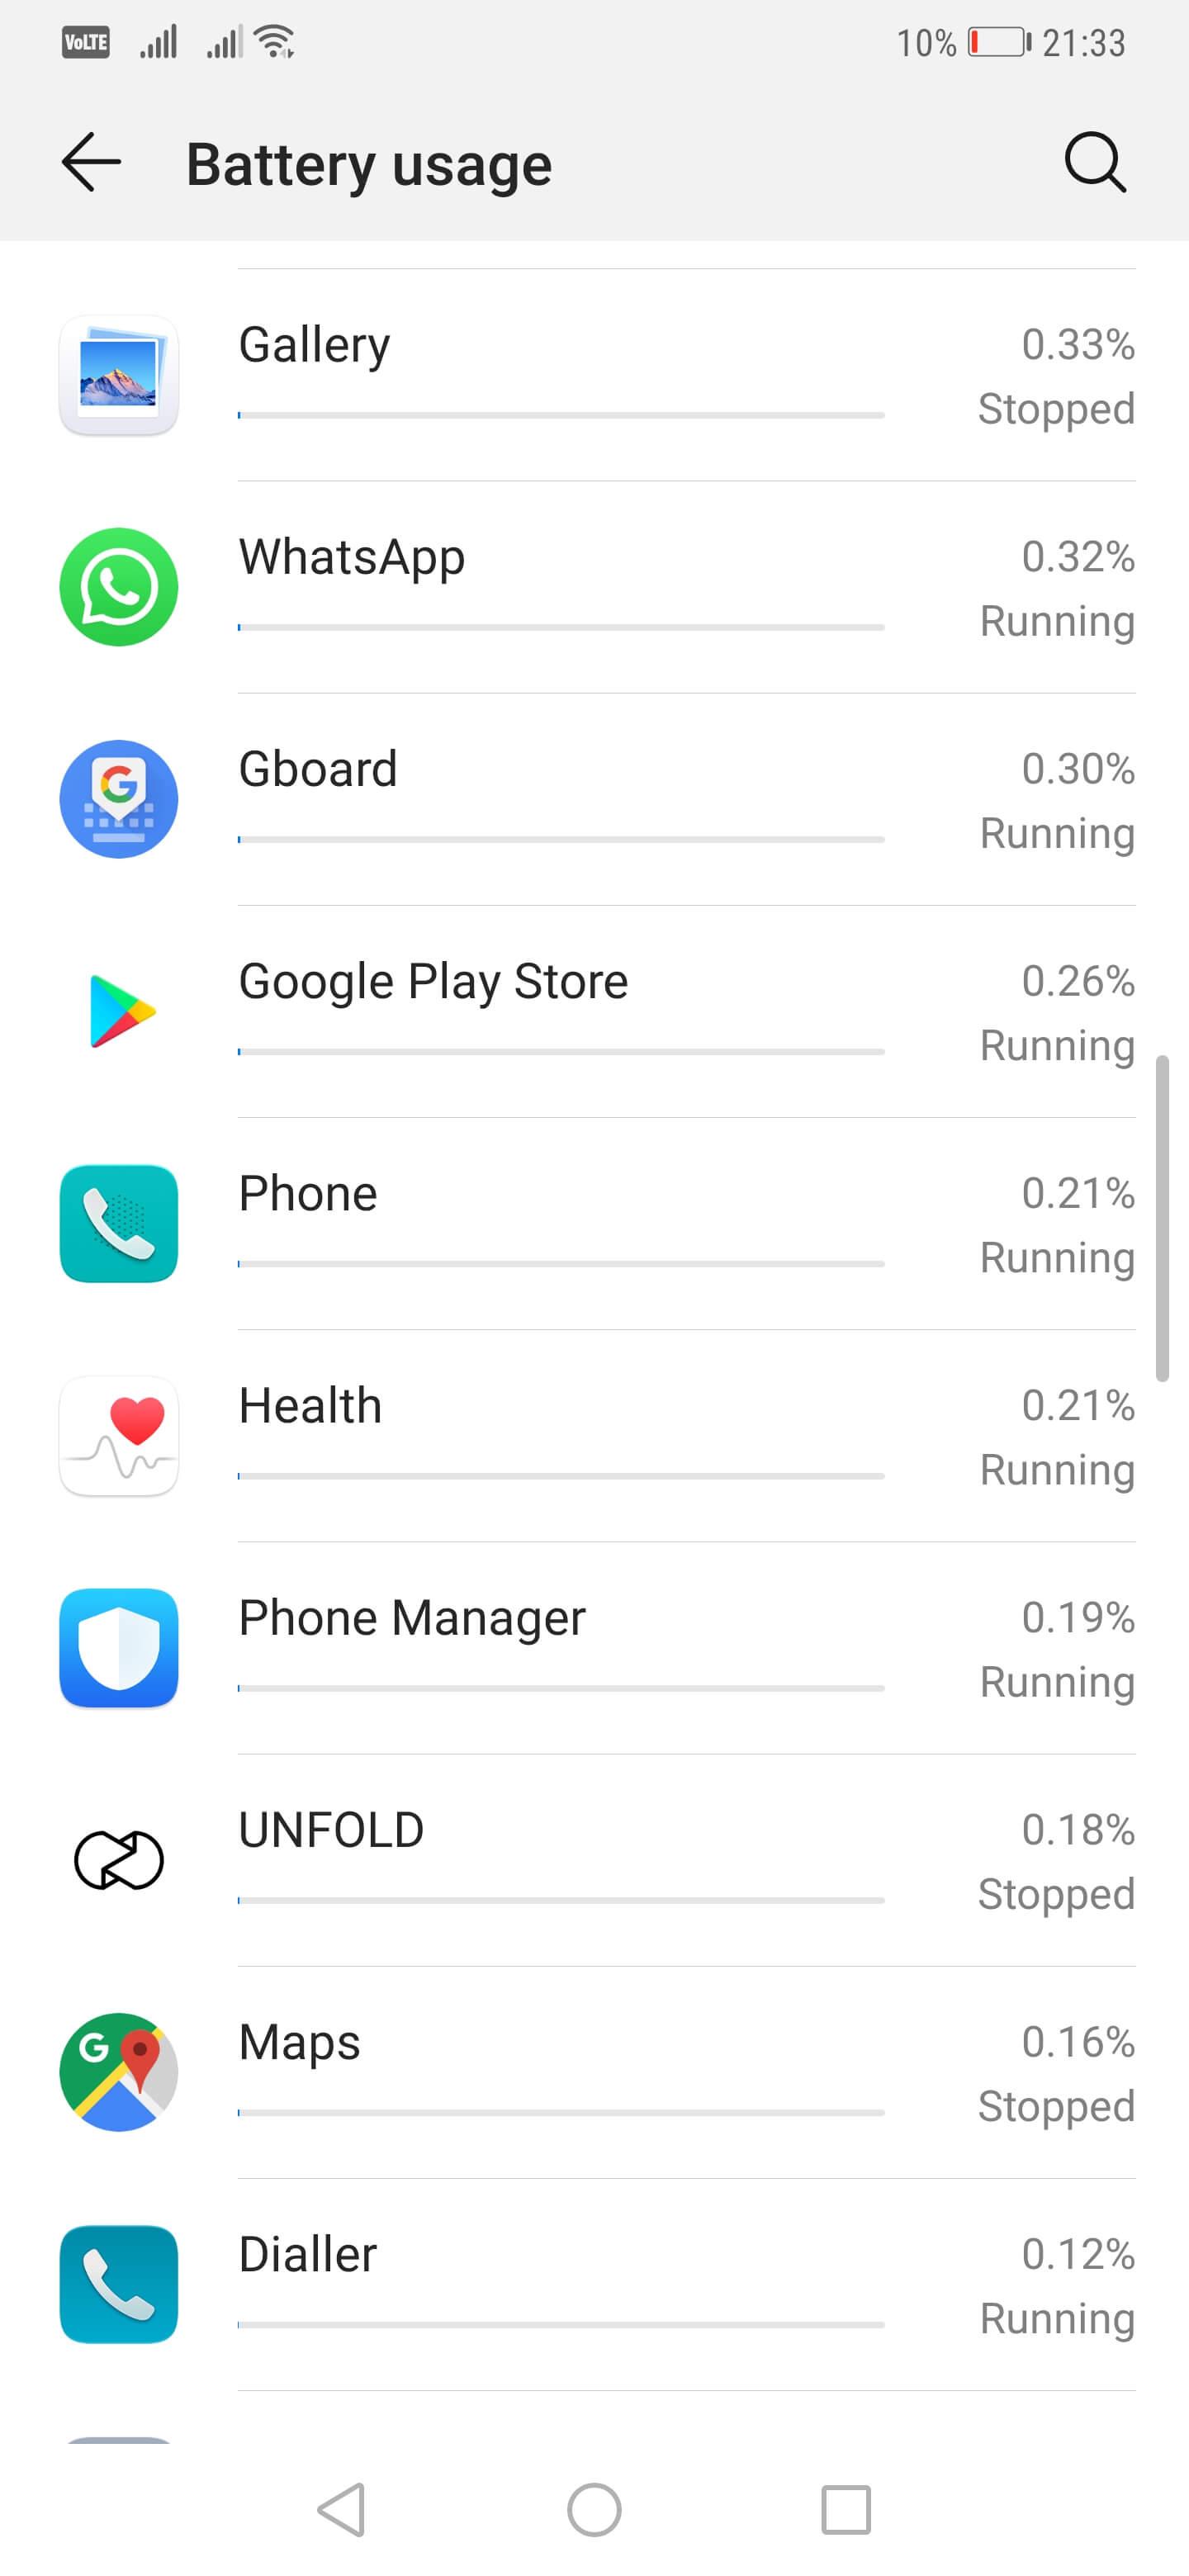 Cat tine bateria pe Huawei Mate 20 Pro - Baterie si autonomie 2